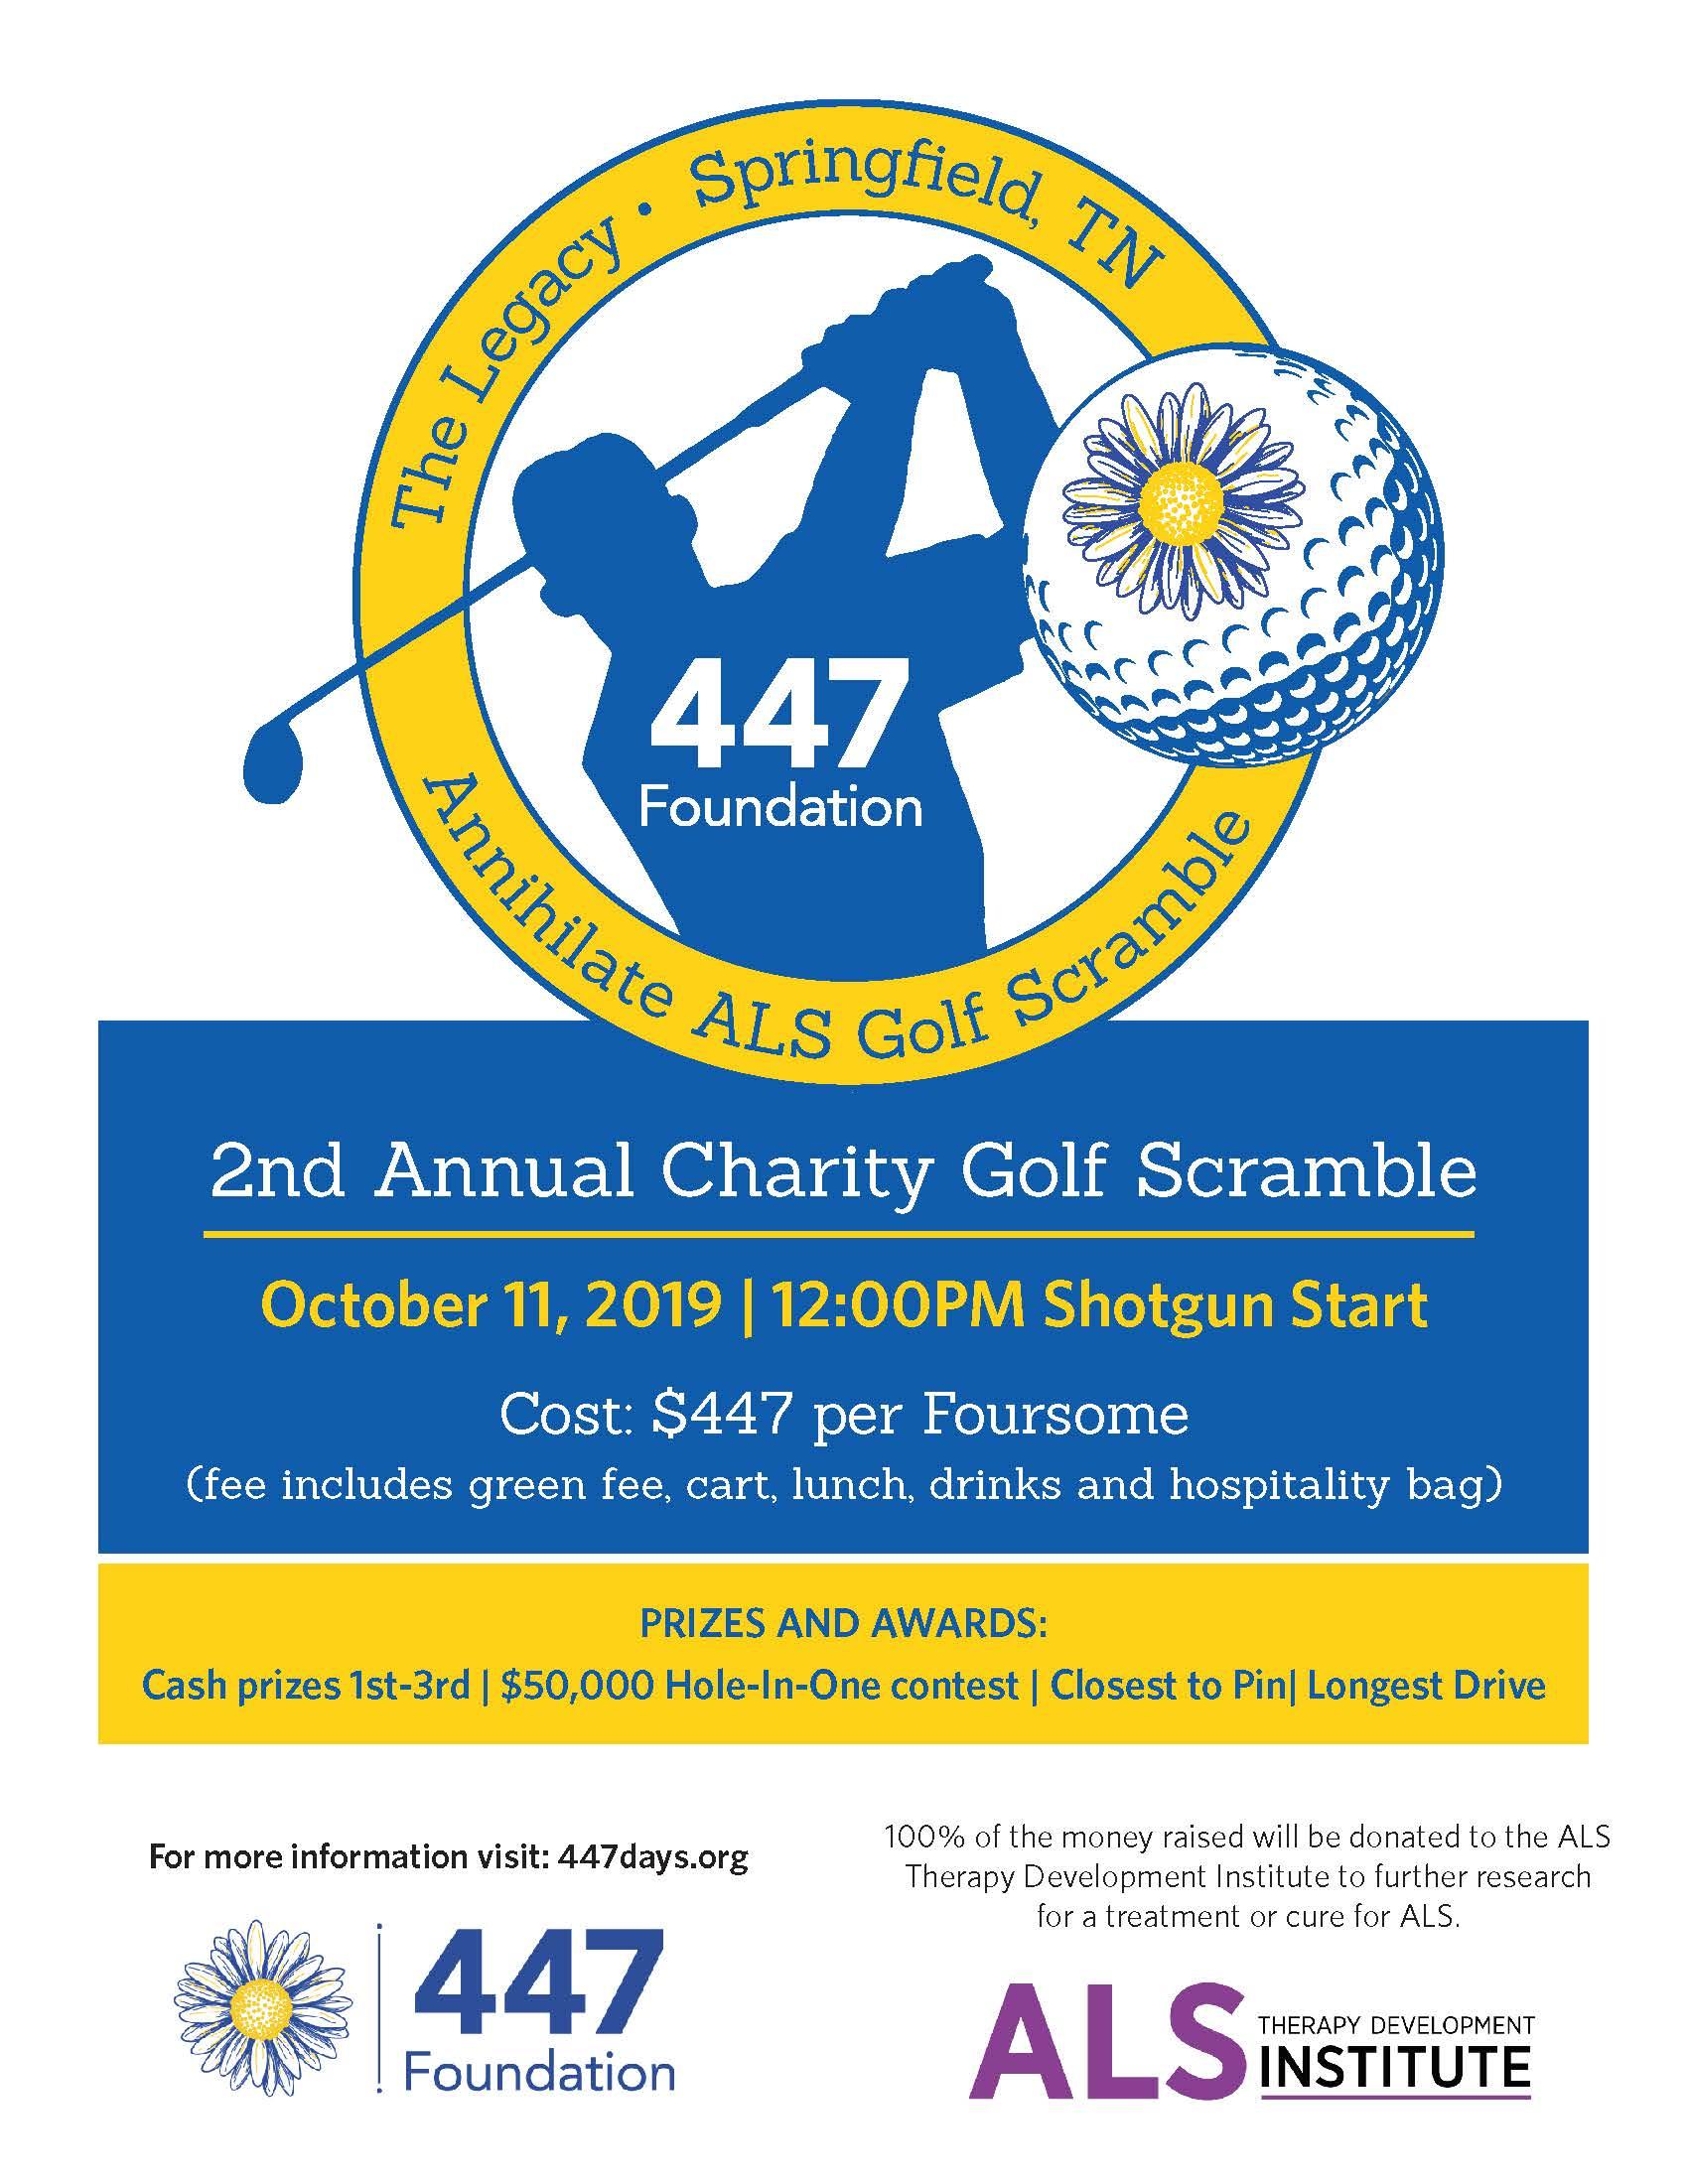 2019 Golf Scramble flyer image_Page_2.jpg